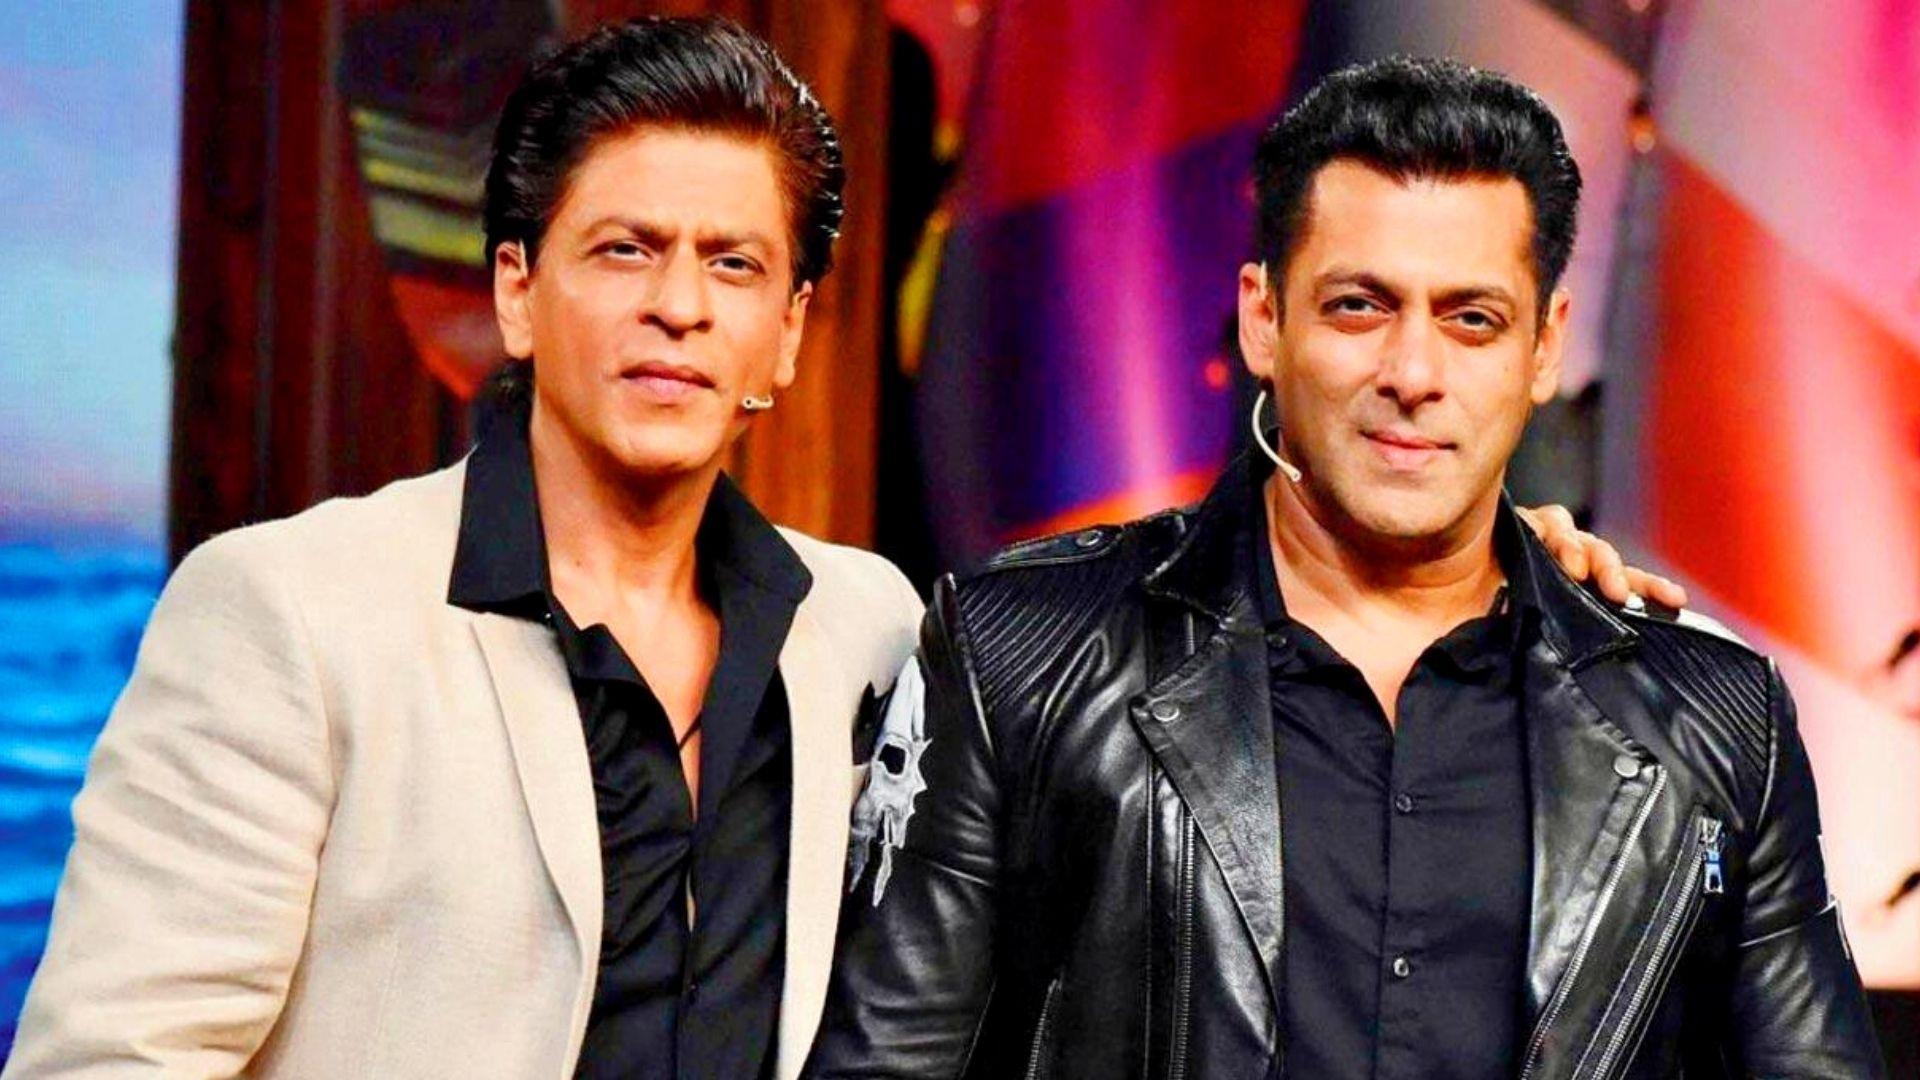 Salman Khan Has Visited Shah Rukh Khan Atleast Three Times Amid Aryan Khan's Arrest; Looks Like This Tough Time Can't do the 'Khans' Apart